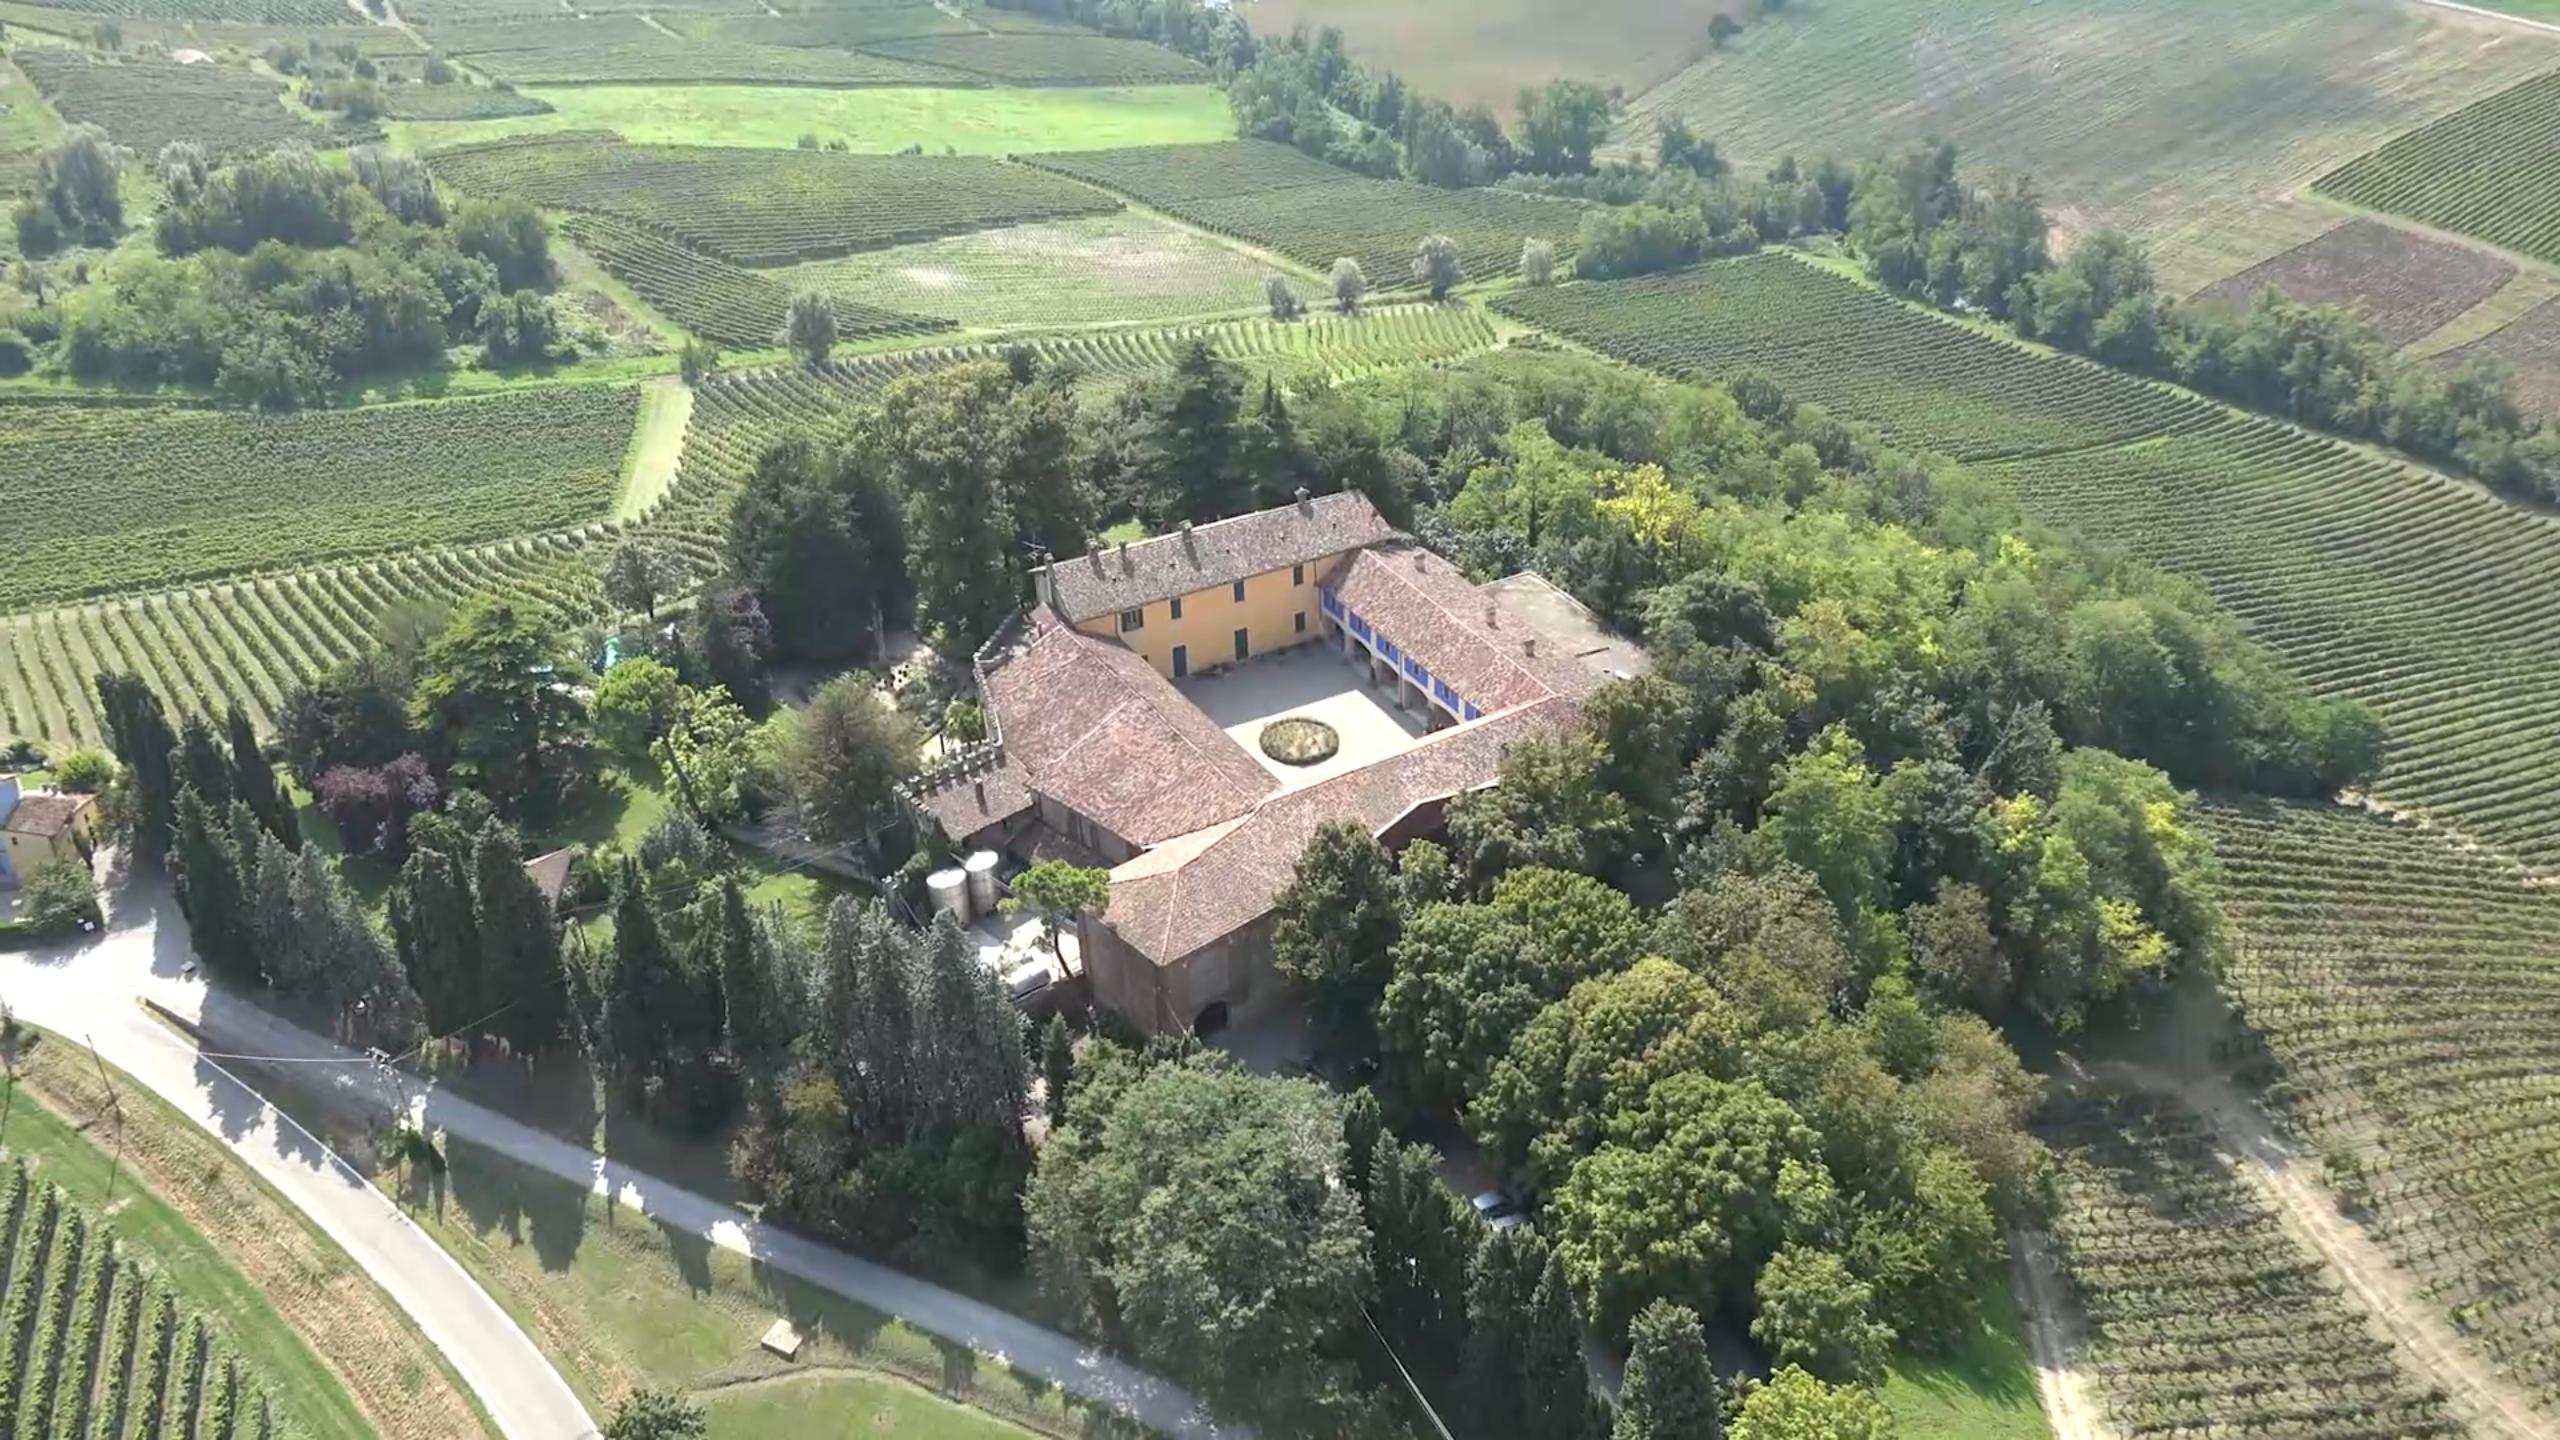 https://www.in-lombardia.it/sites/default/files/accomodation/images/107278/44411/veduta_castello_di_luzzano_corte.png